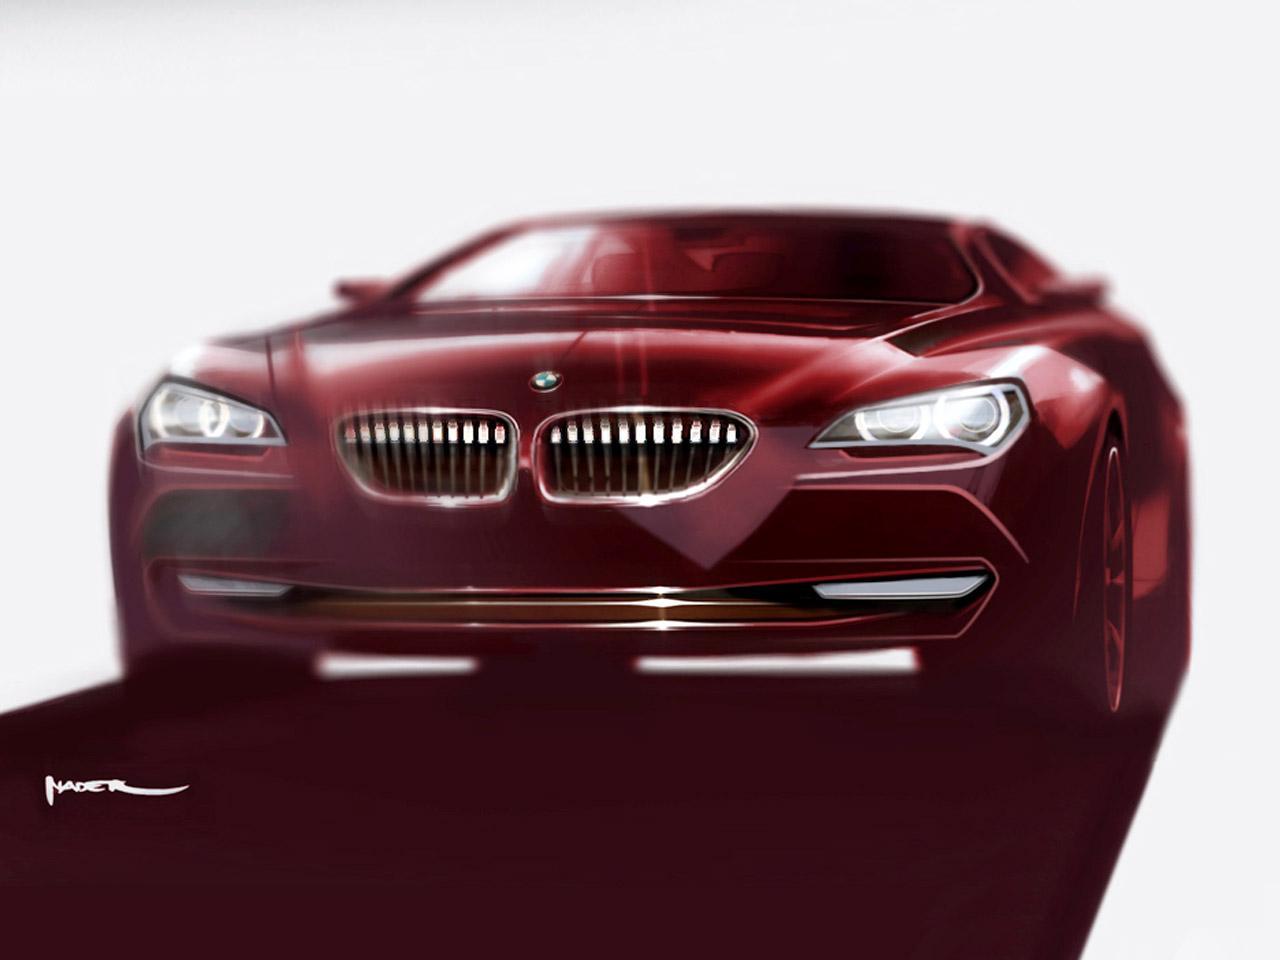 BMW 6 Series Coupe Design Sketch - Car Body Design